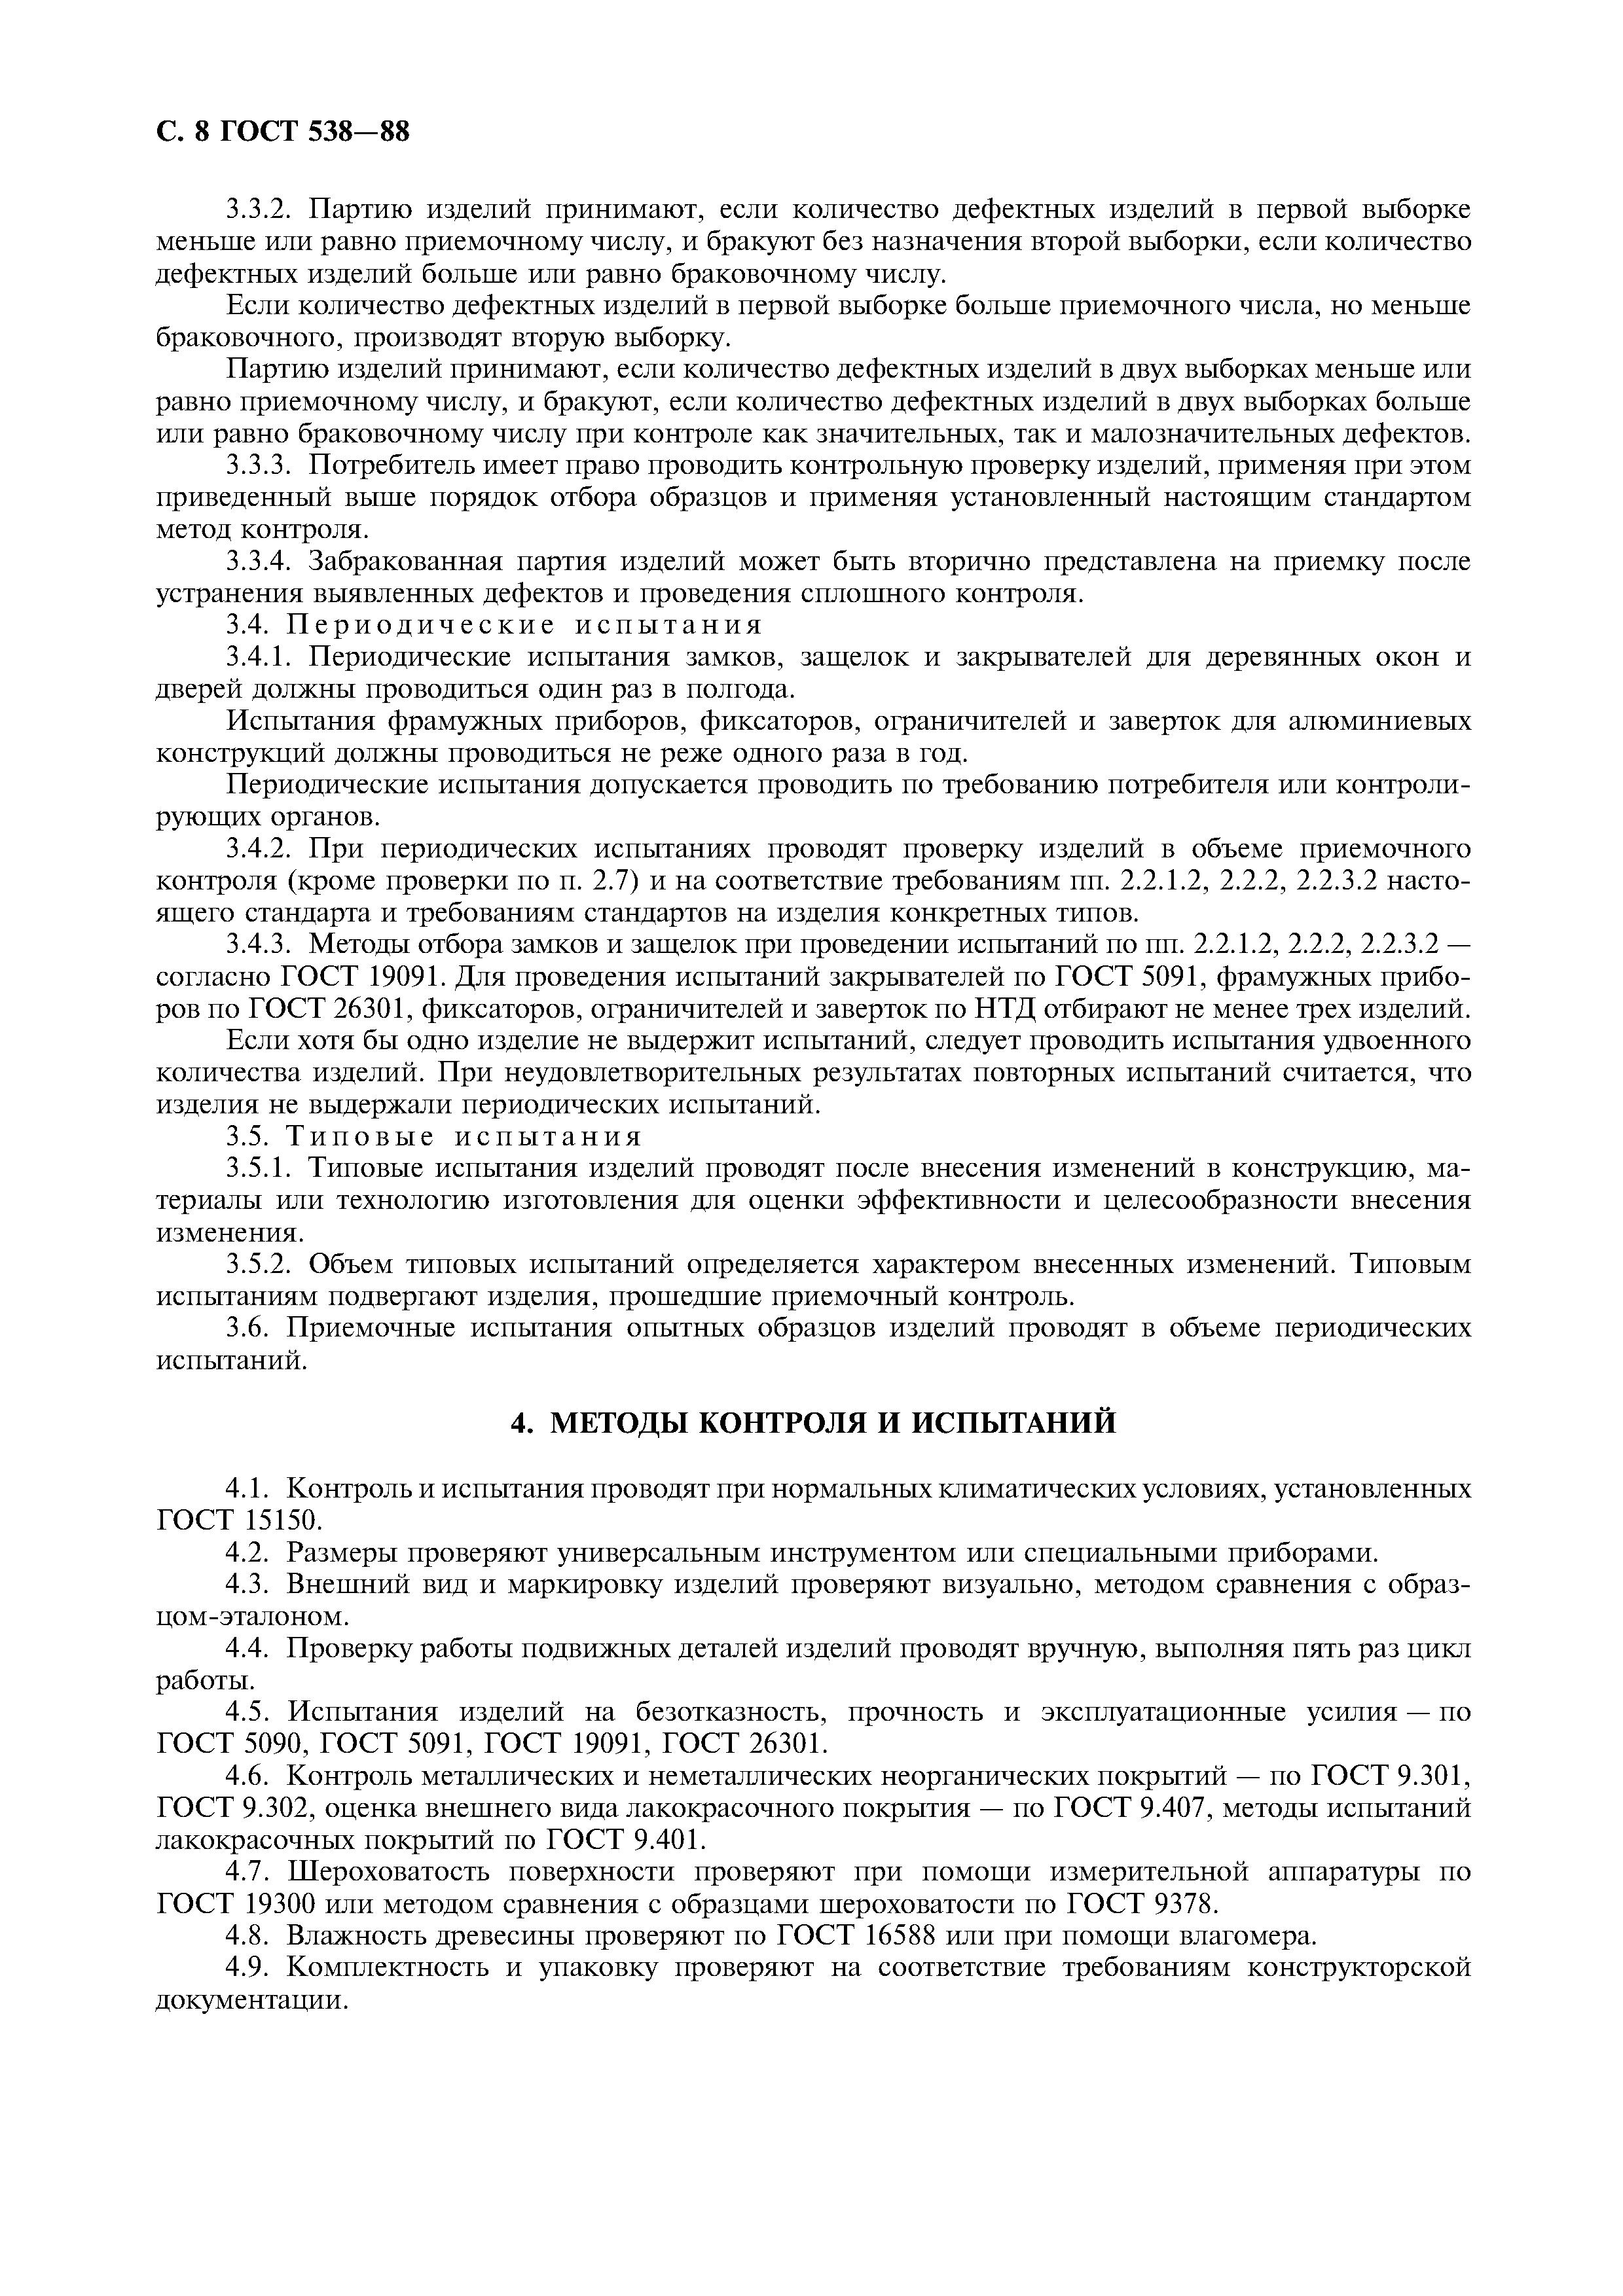 Гост 538-88